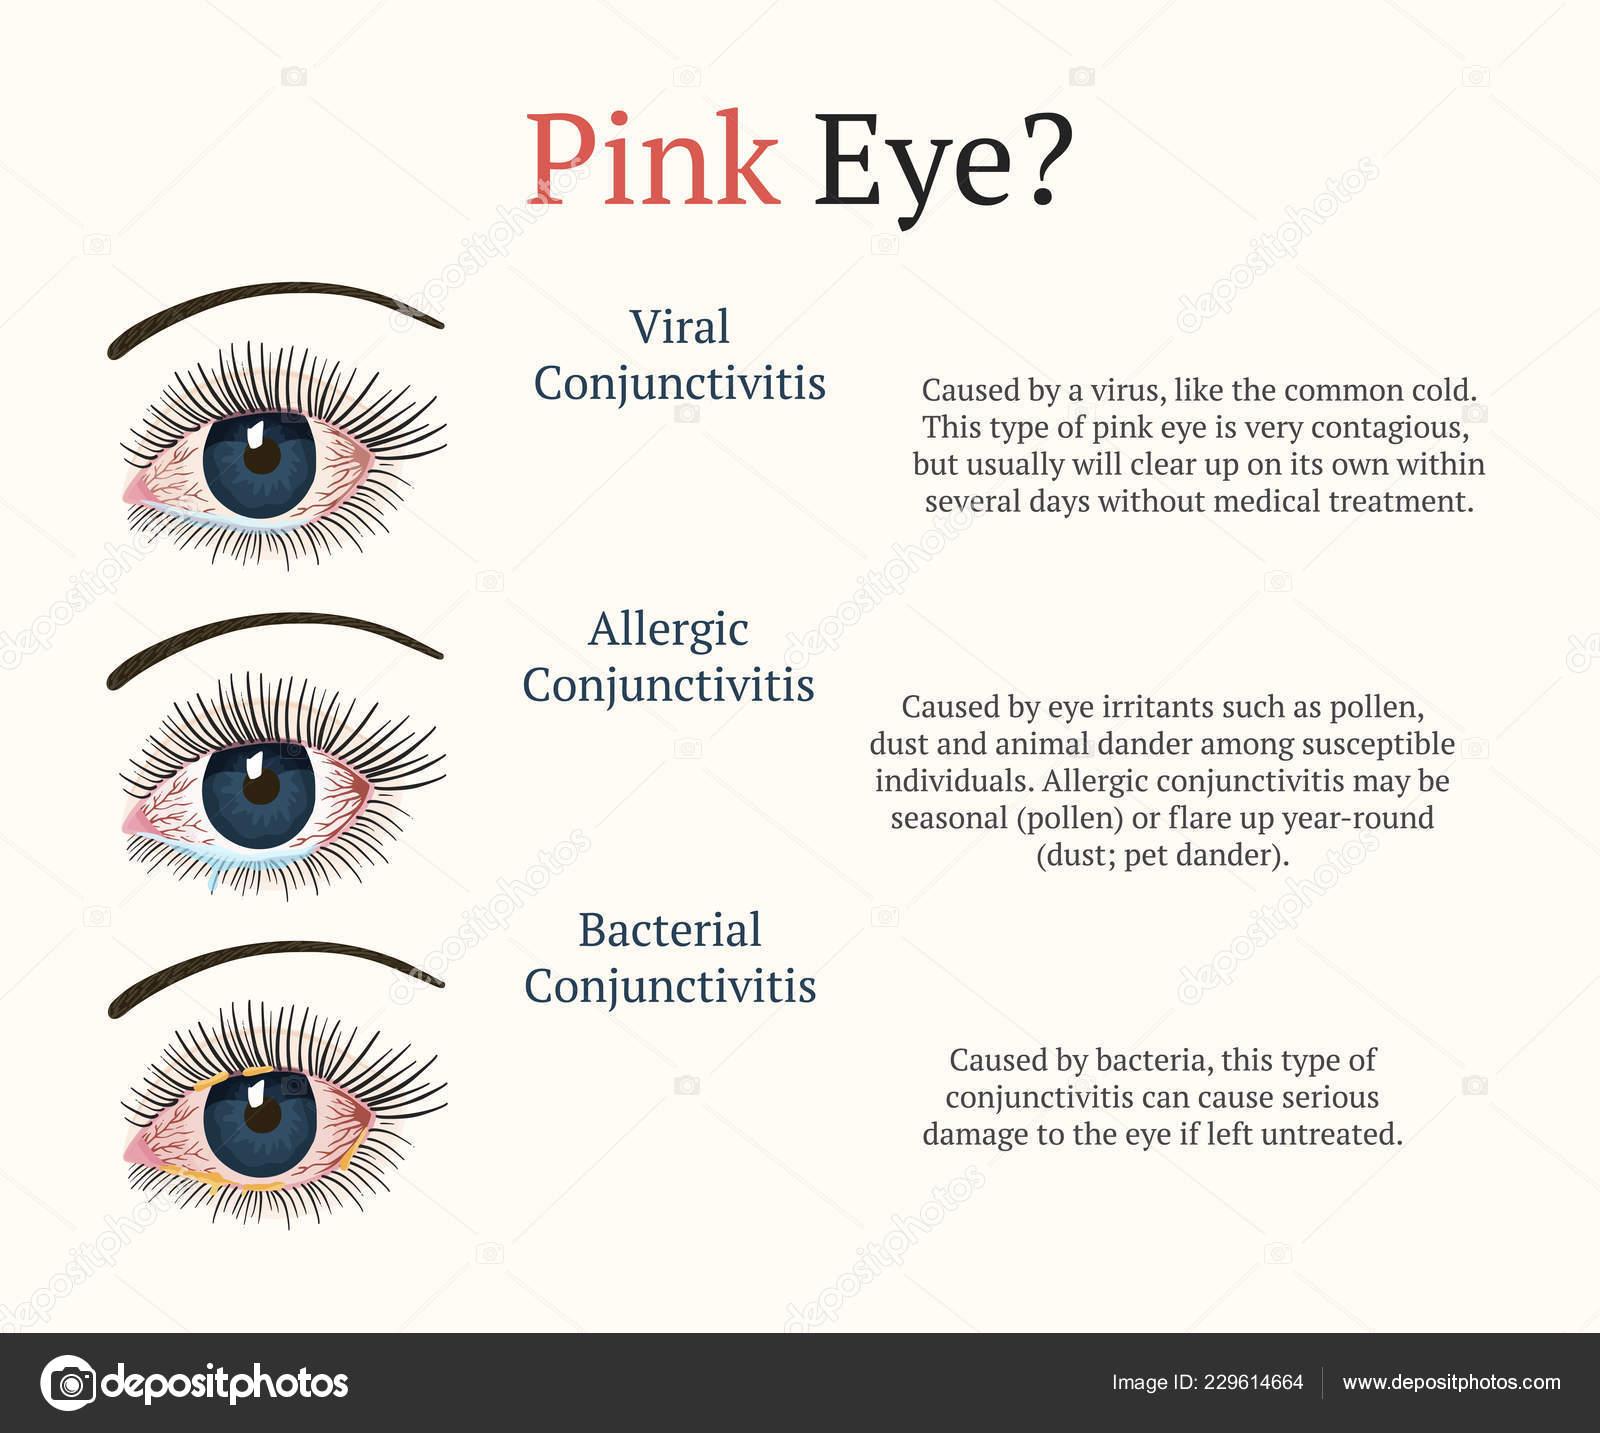 c88c3fed40 Ασθένεια των ματιών. Εικονογράφηση υγείας οφθαλμολογία ...